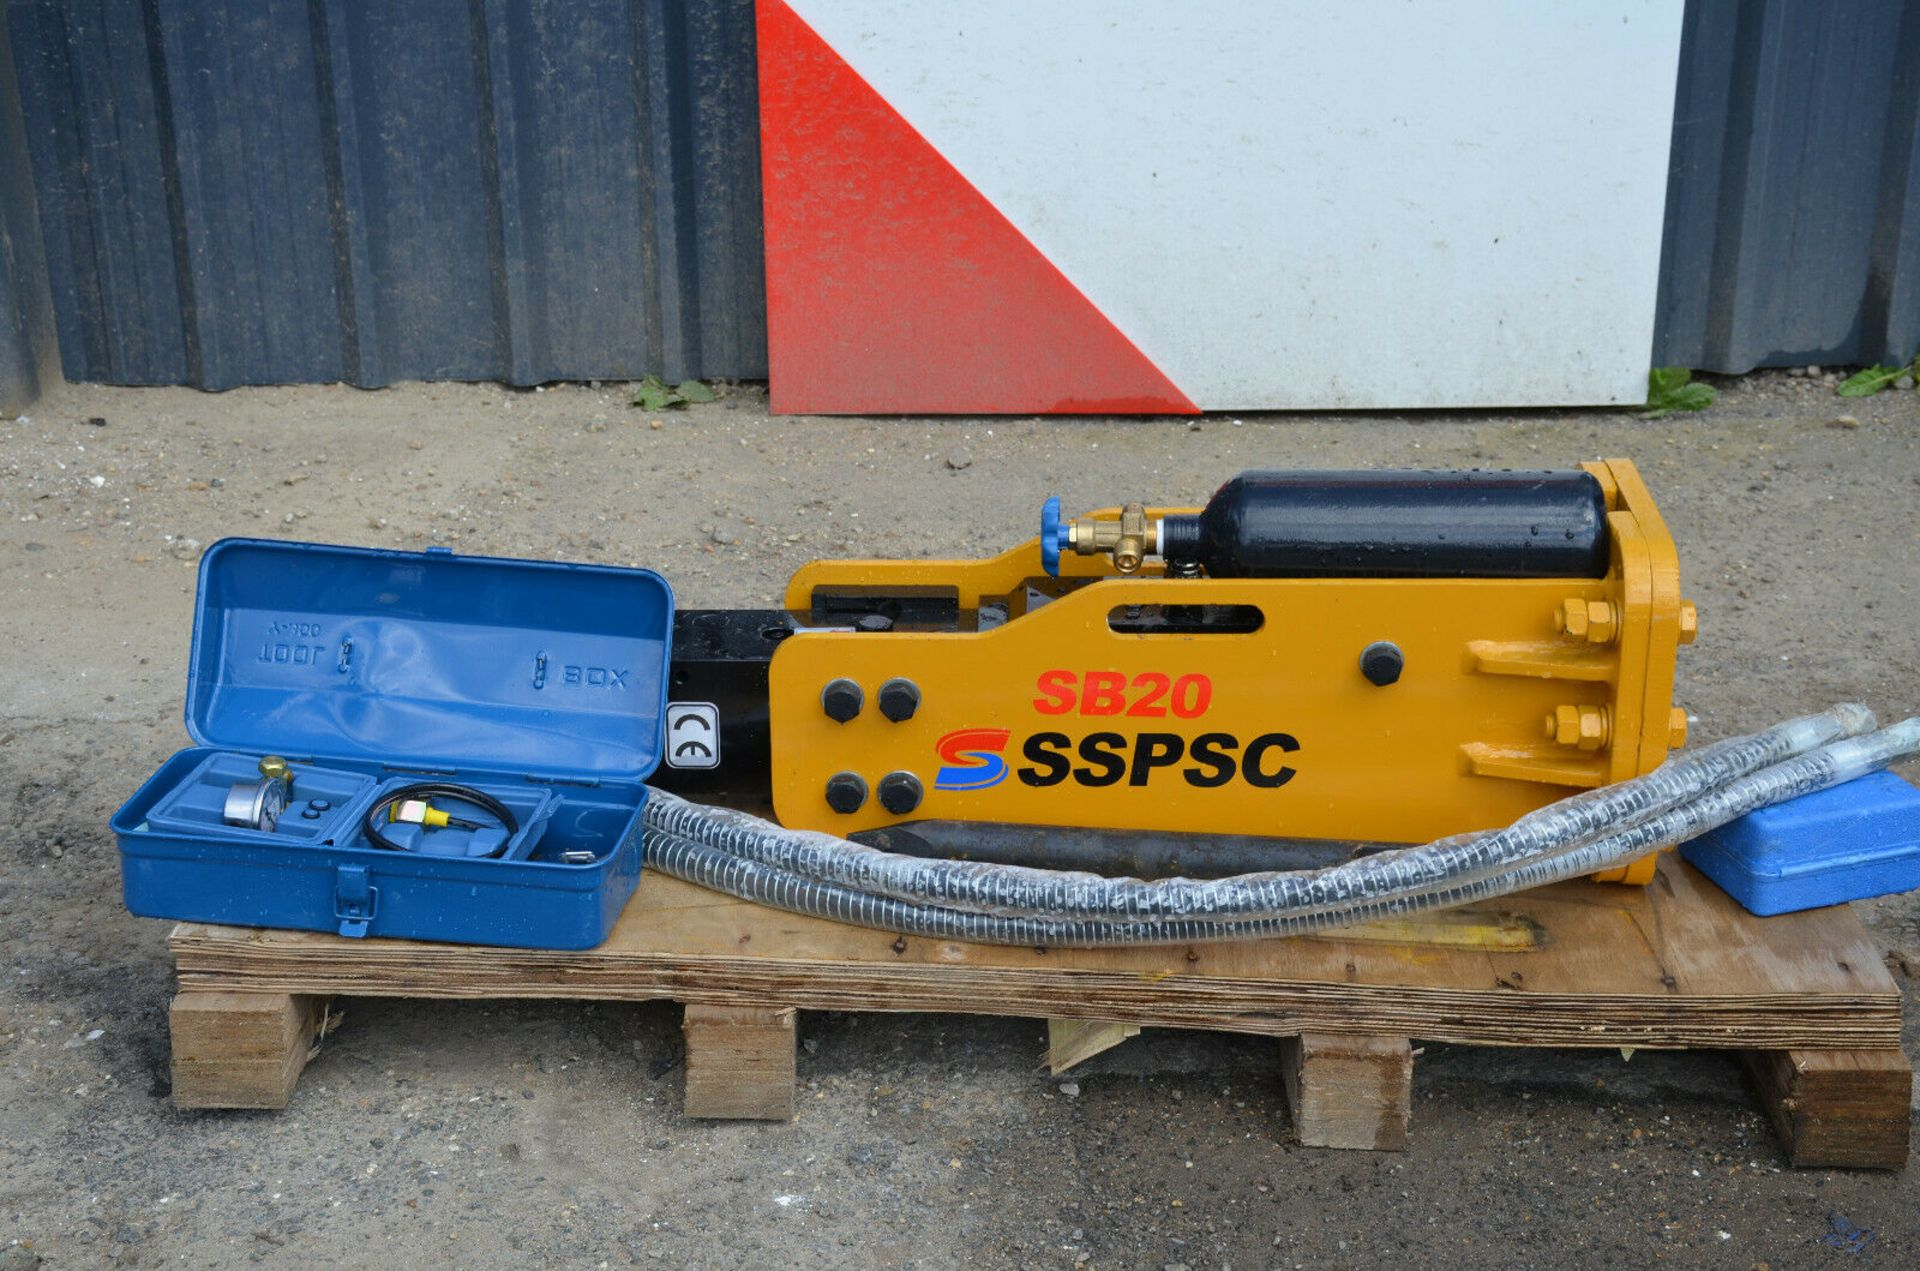 SSPSC SB20 Hydraulic Breaker - Image 4 of 6